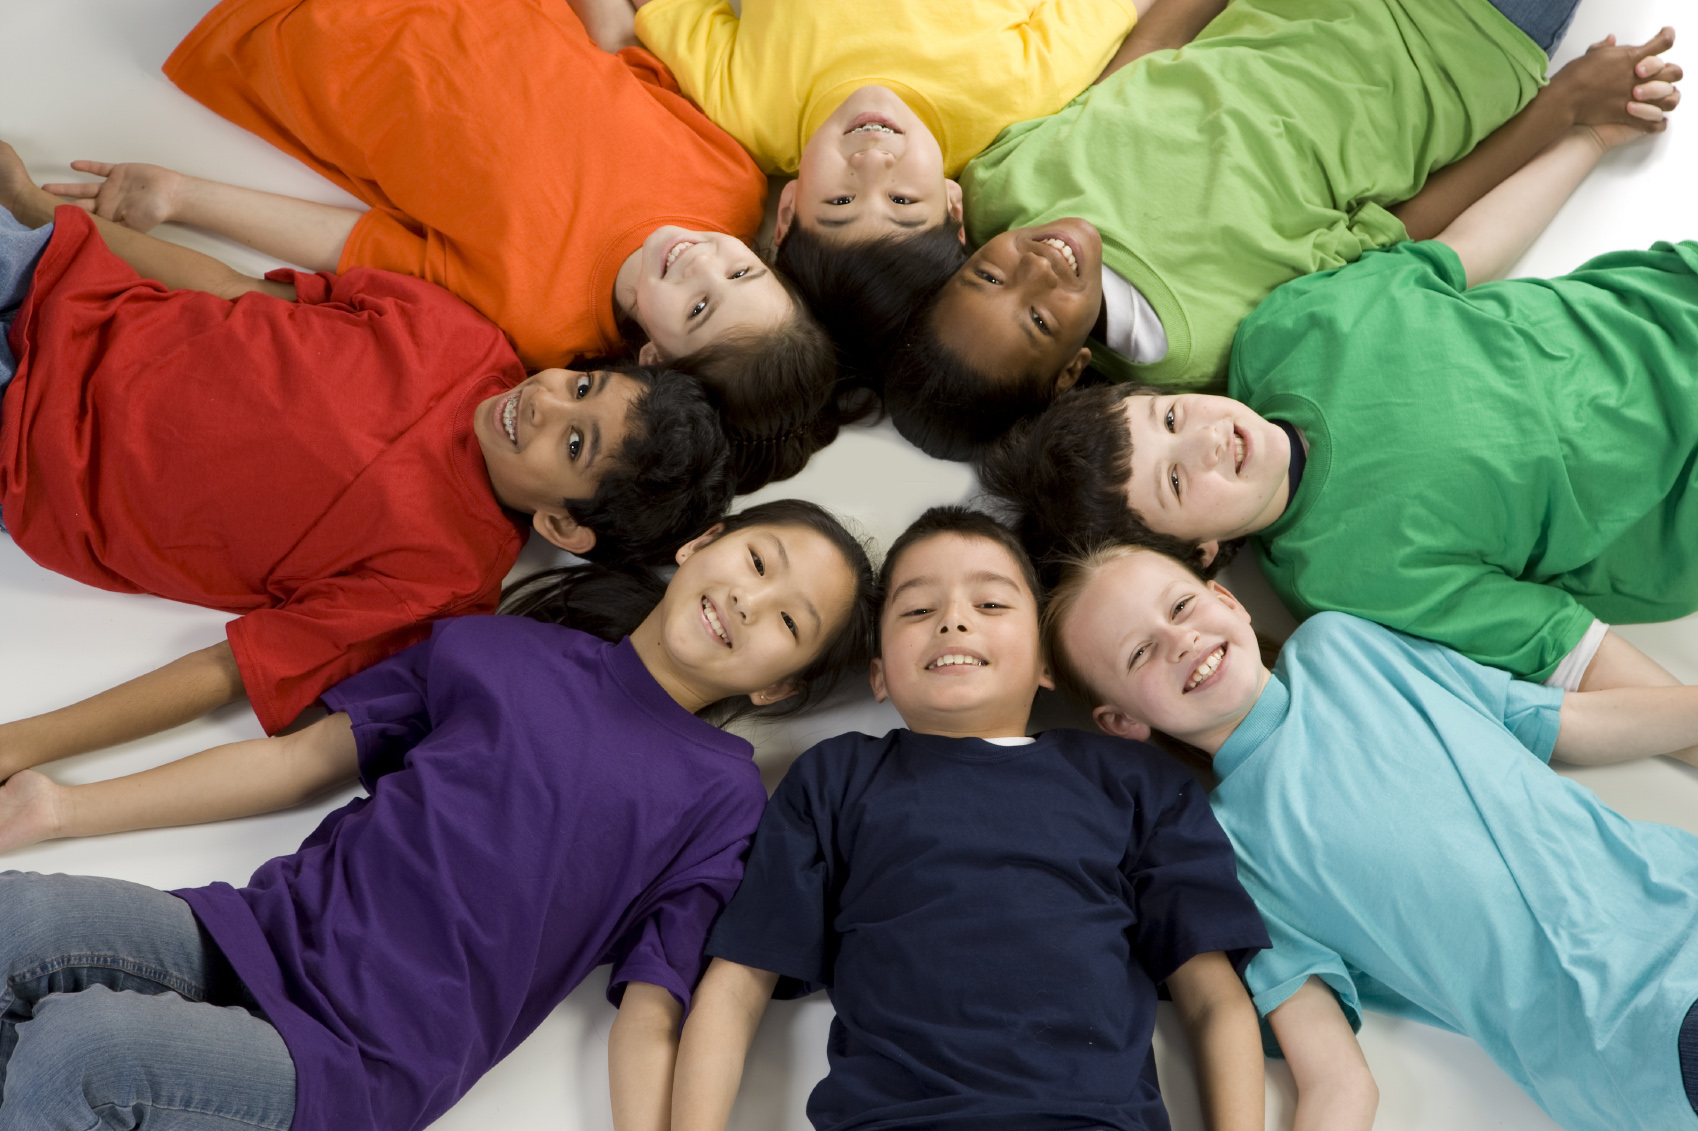 Children-in-a-Circle2.jpg